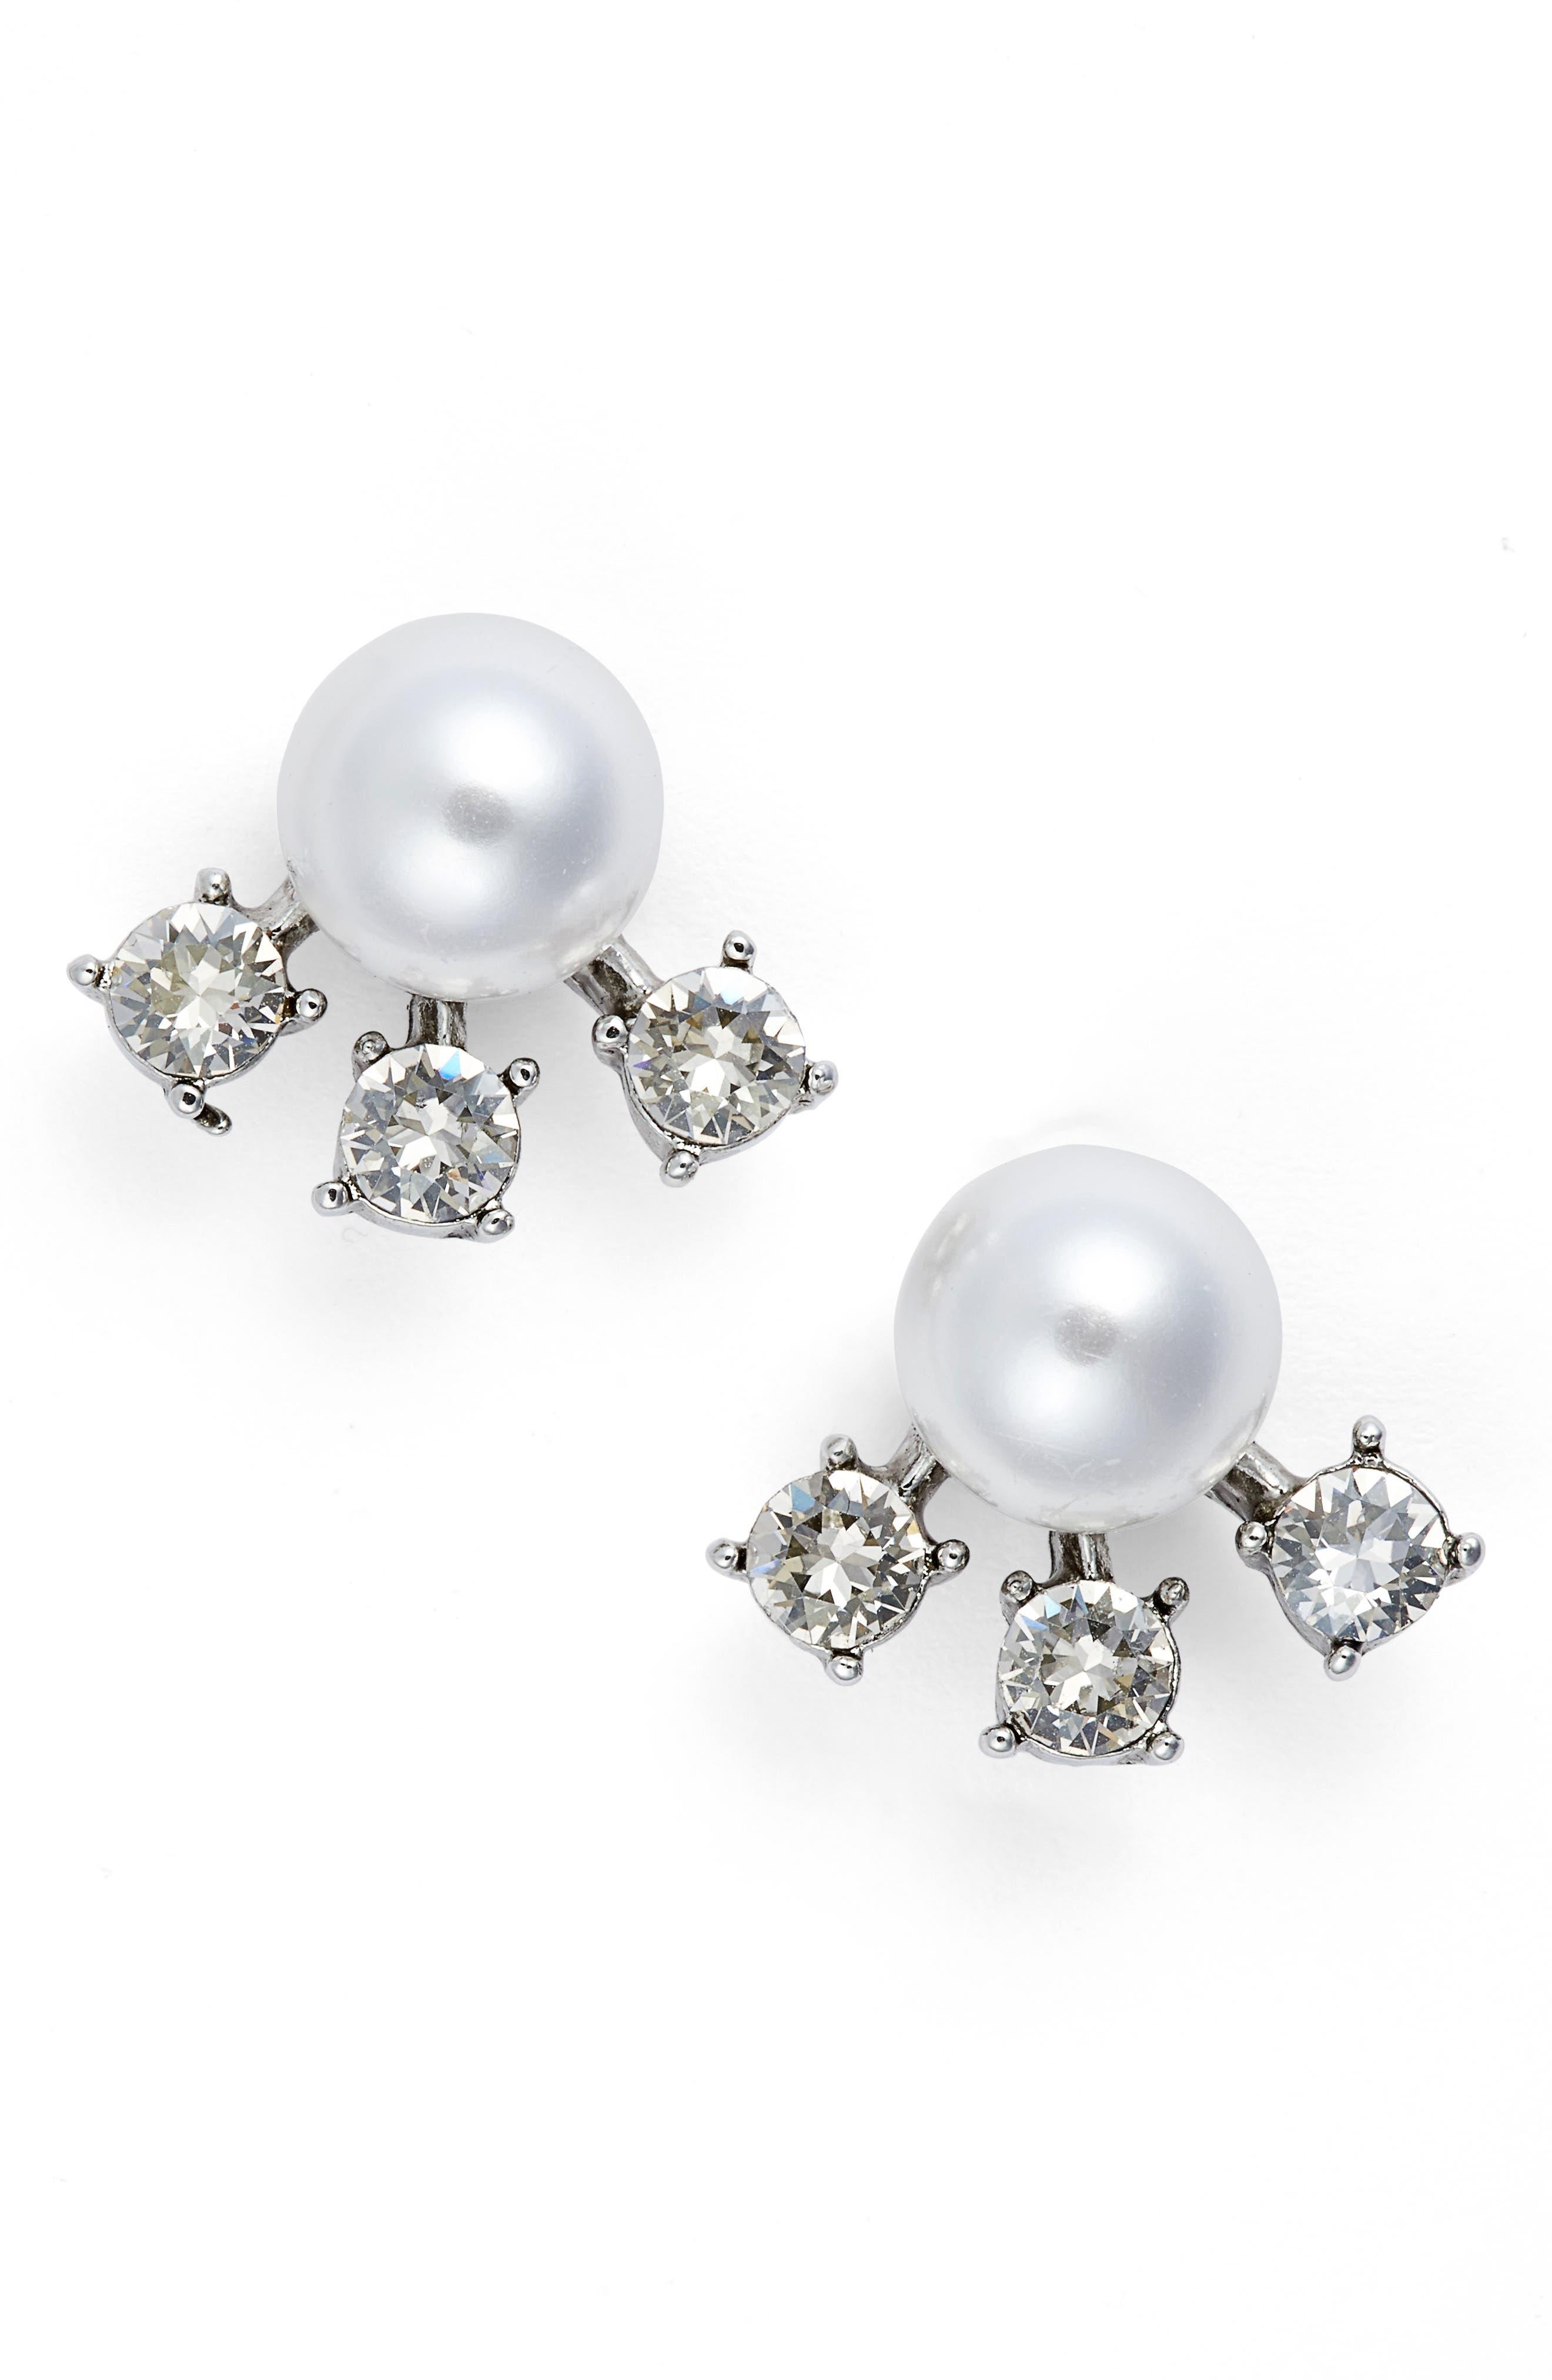 Simulated Pearl & Crystal Ear Jackets,                         Main,                         color, Crystal Shade / Silver